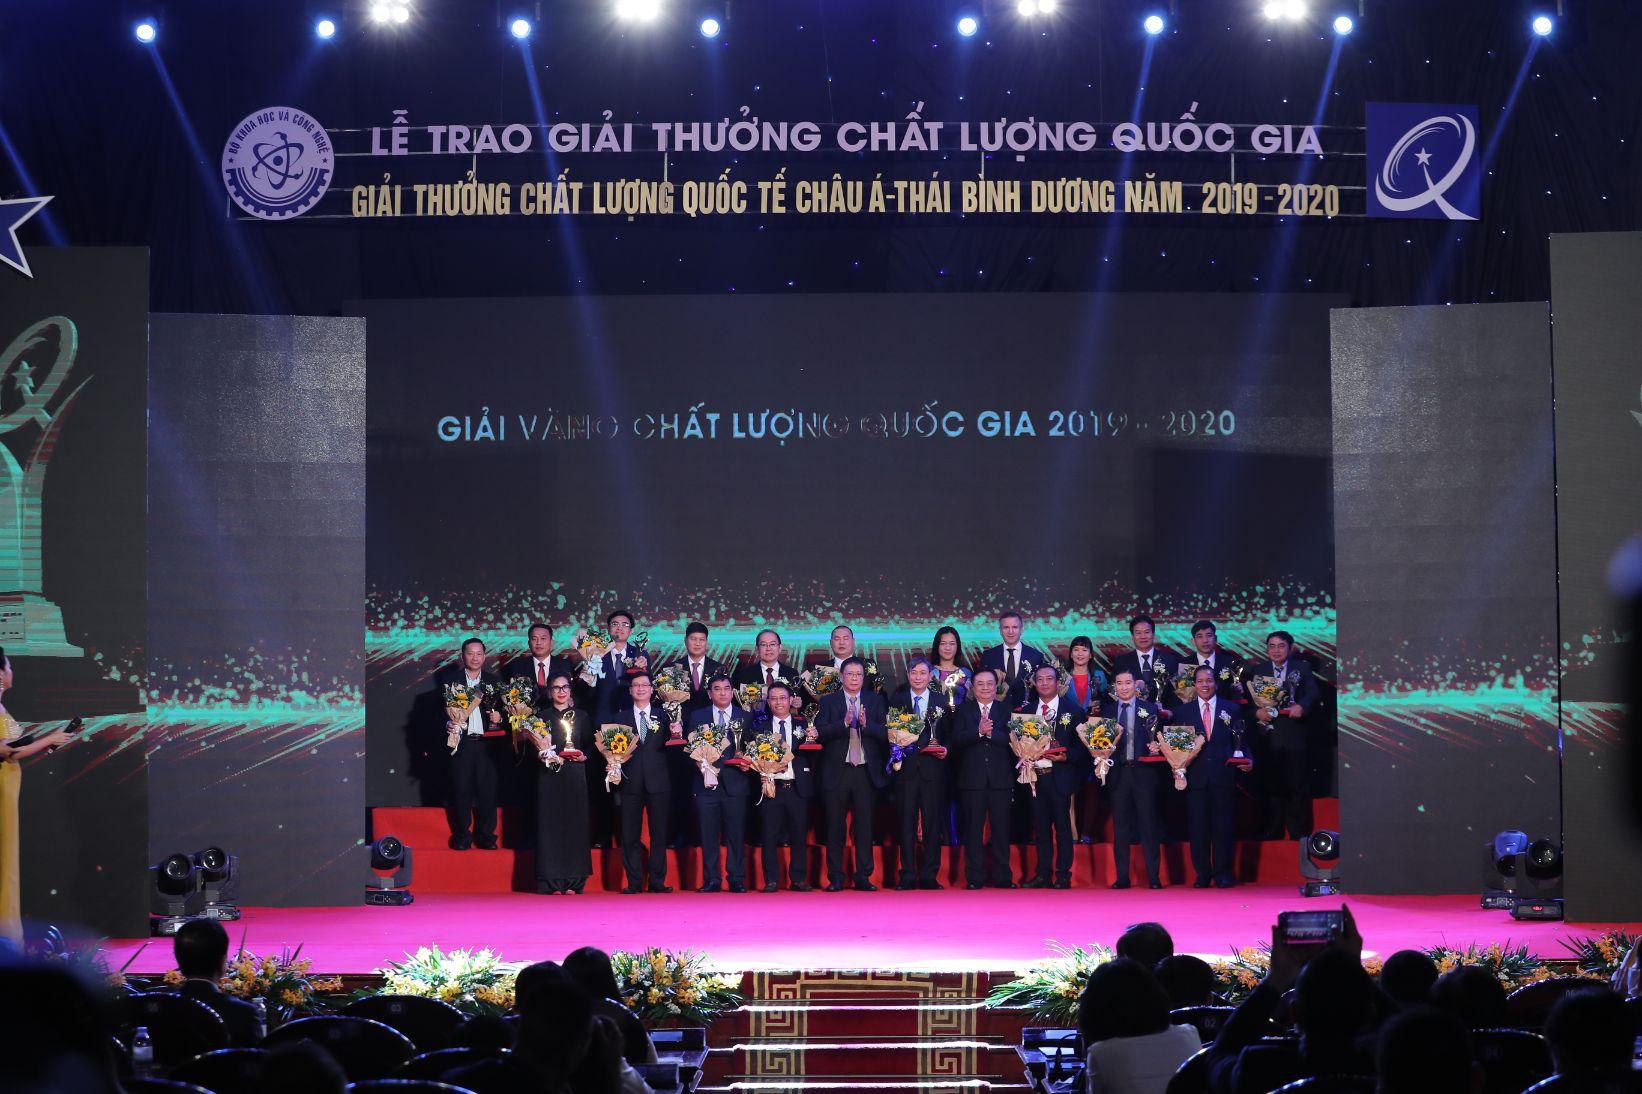 Dai Dien Nestle Nhan Giai Vang Chat Luong Quoc Gia 1